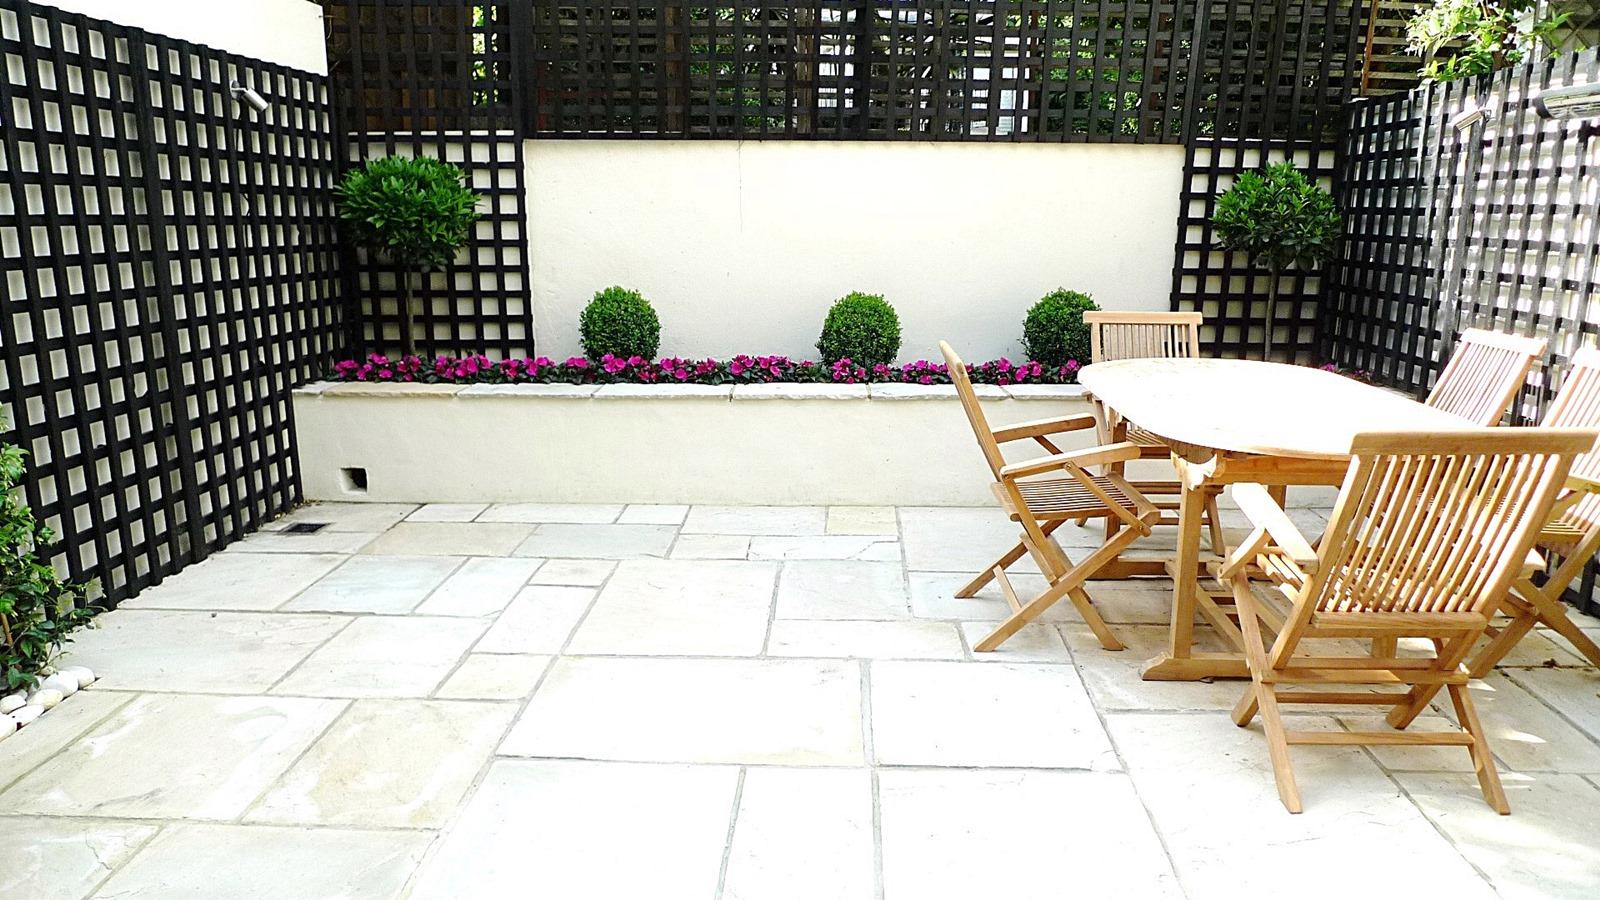 Sandstone Paving Patio Raised Beds Classic Modern Planting